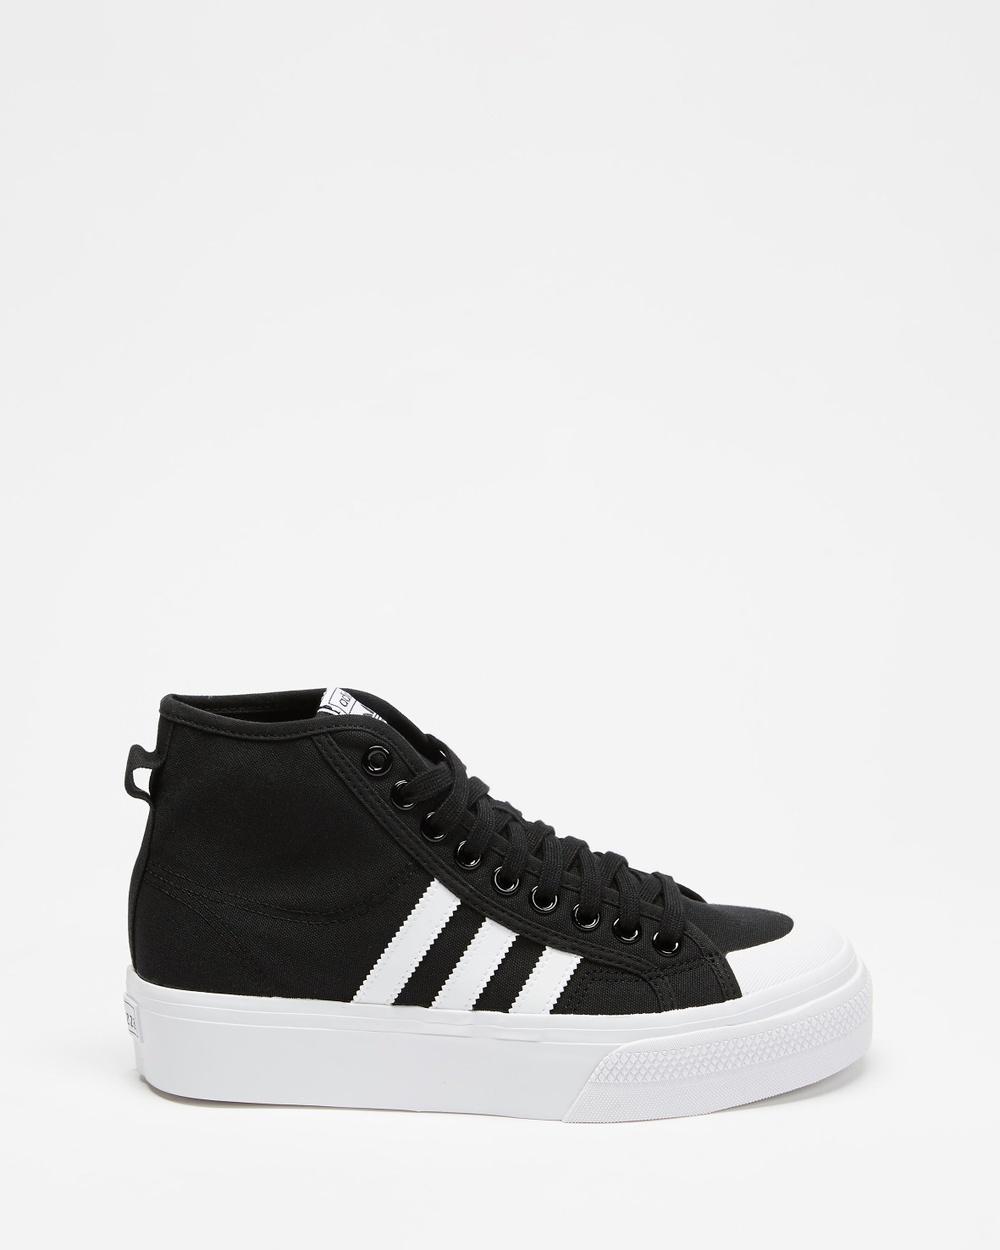 adidas Originals Nizza Hi Platform Women's Lifestyle Sneakers Core Black, Footwear White & White